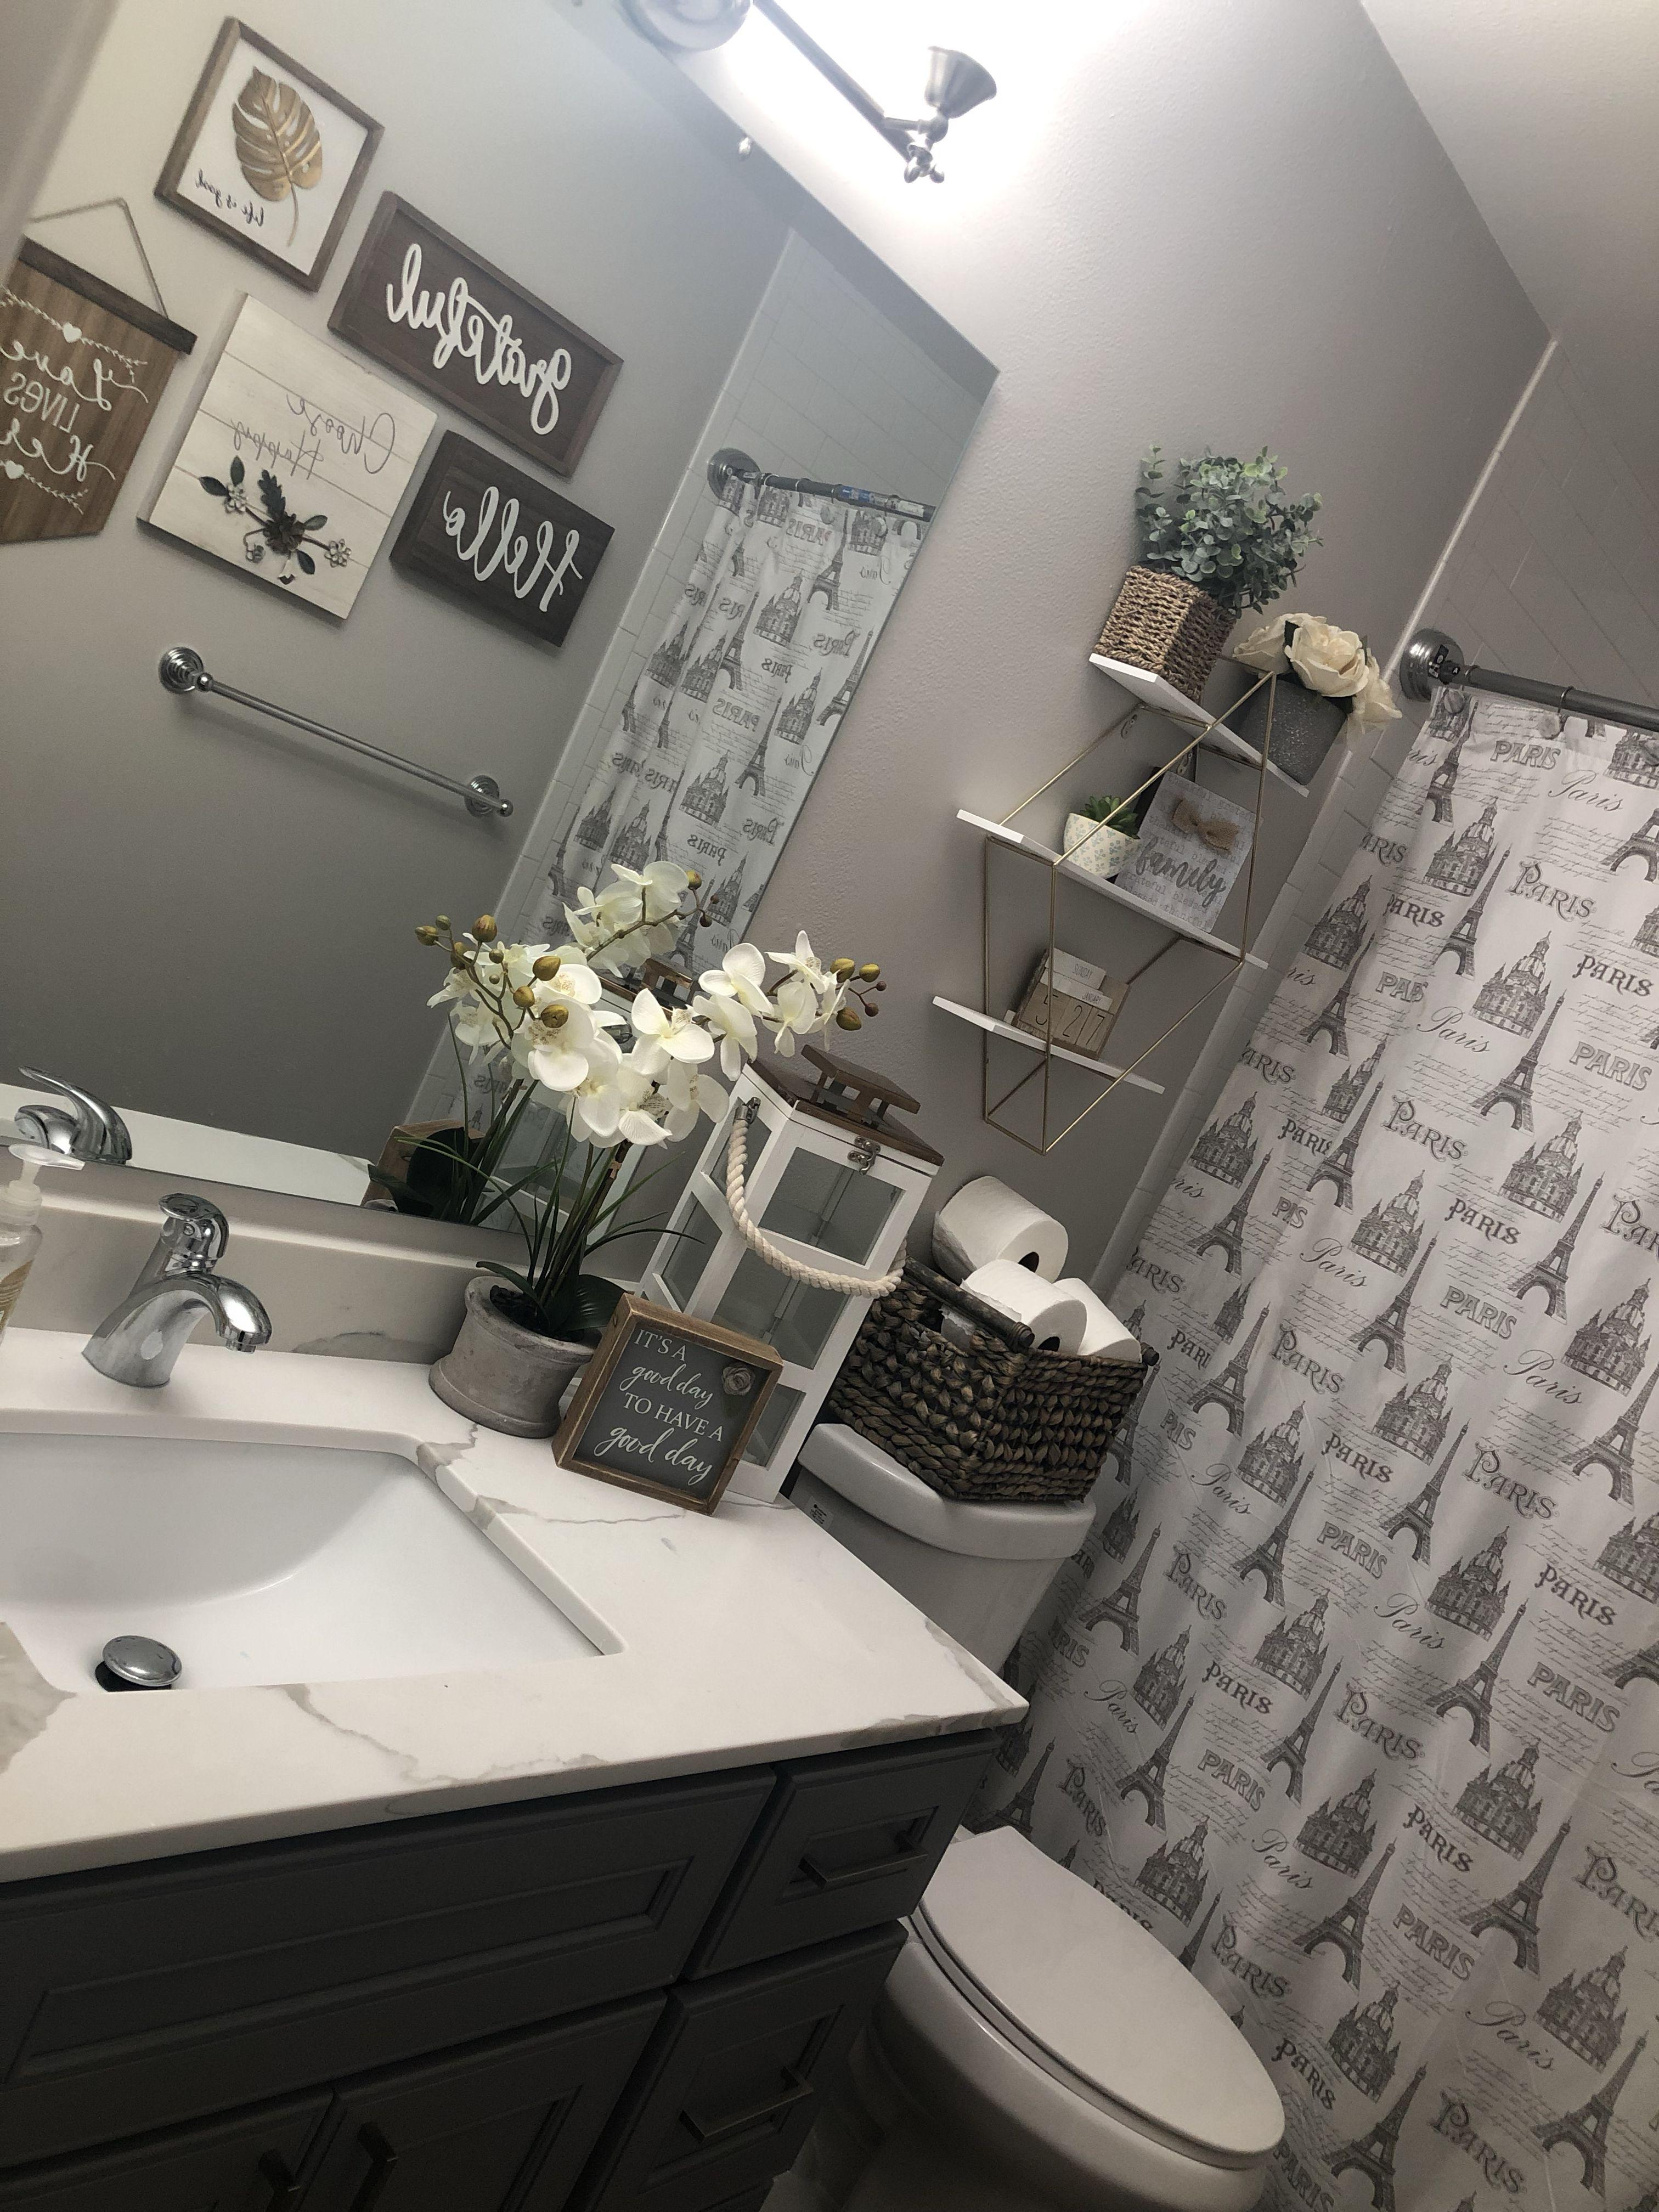 Bathroom Decor Ideas Small Gold Bathroom Decor Brown Bathroom Decor White Bathroom Decor Decorate my bathroom walls